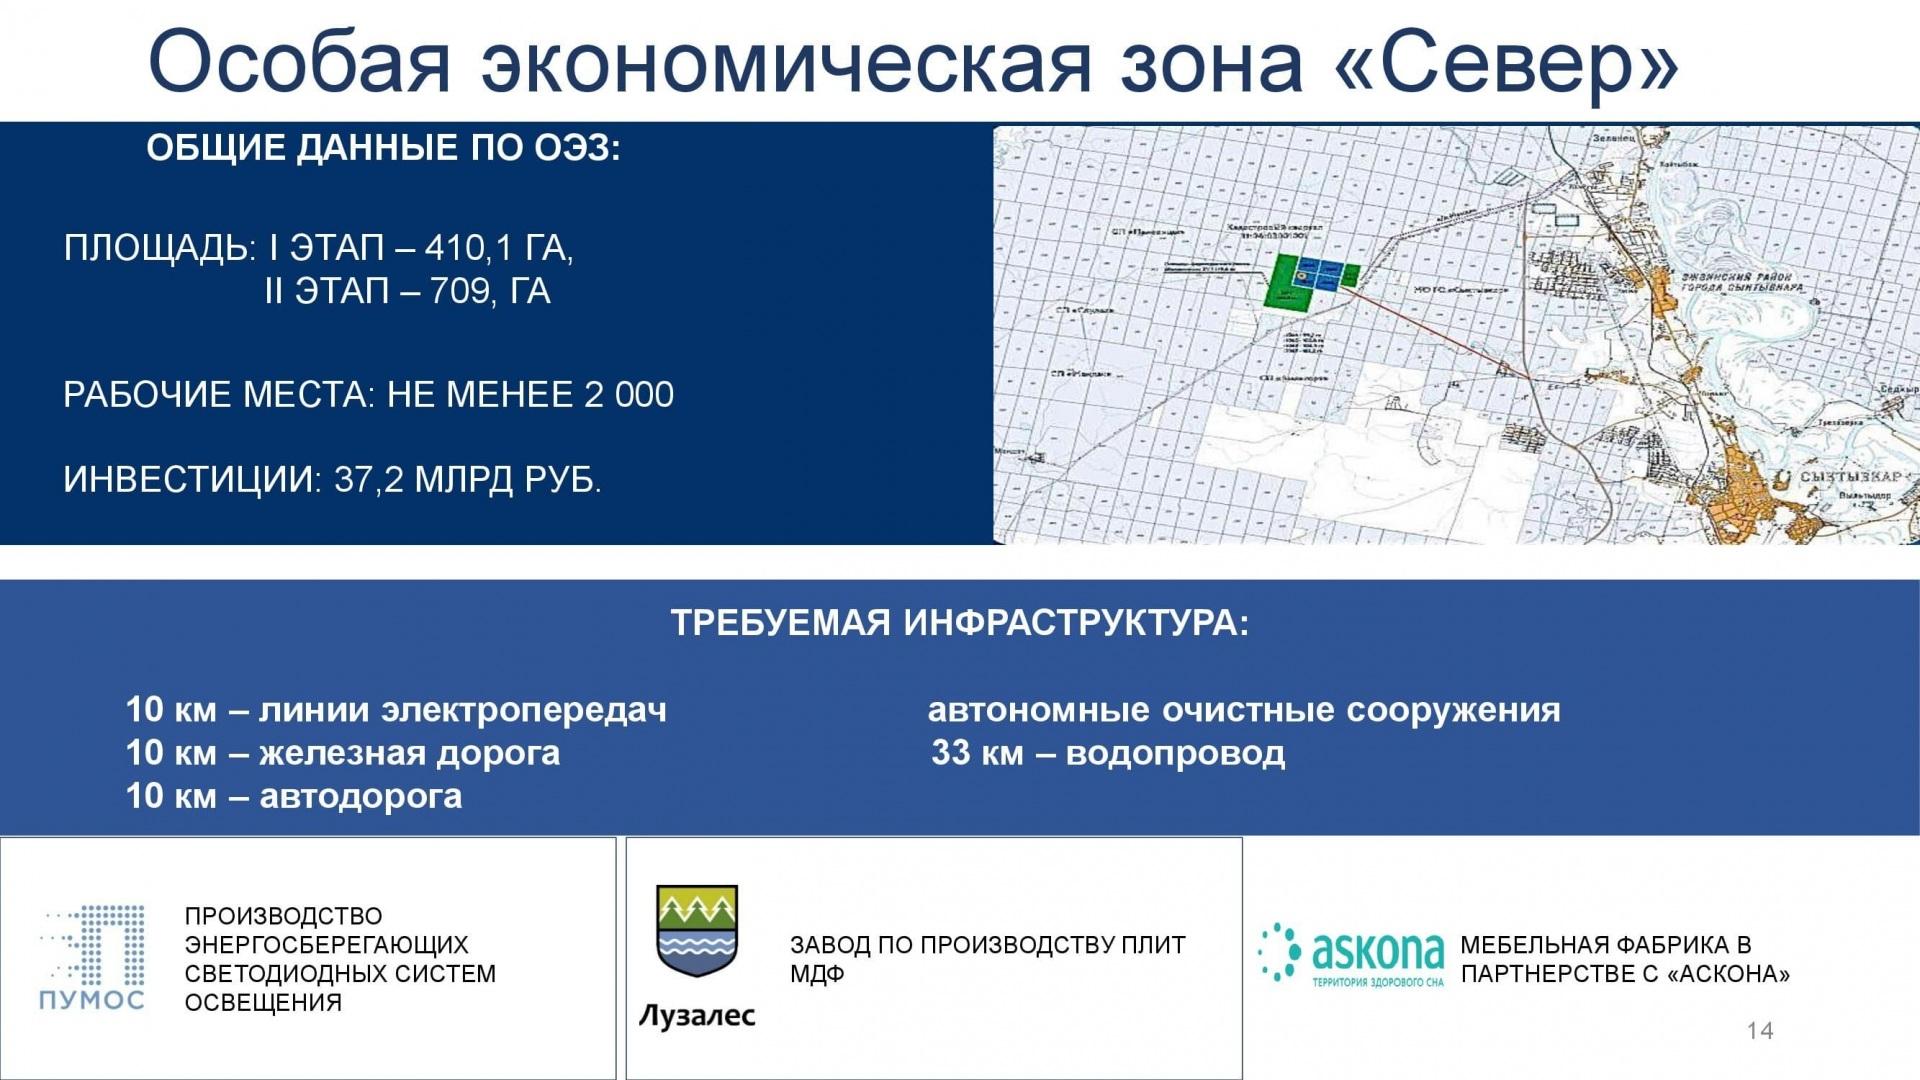 Investposlanie-Glavy-RK_21.08.2021_00014.jpg